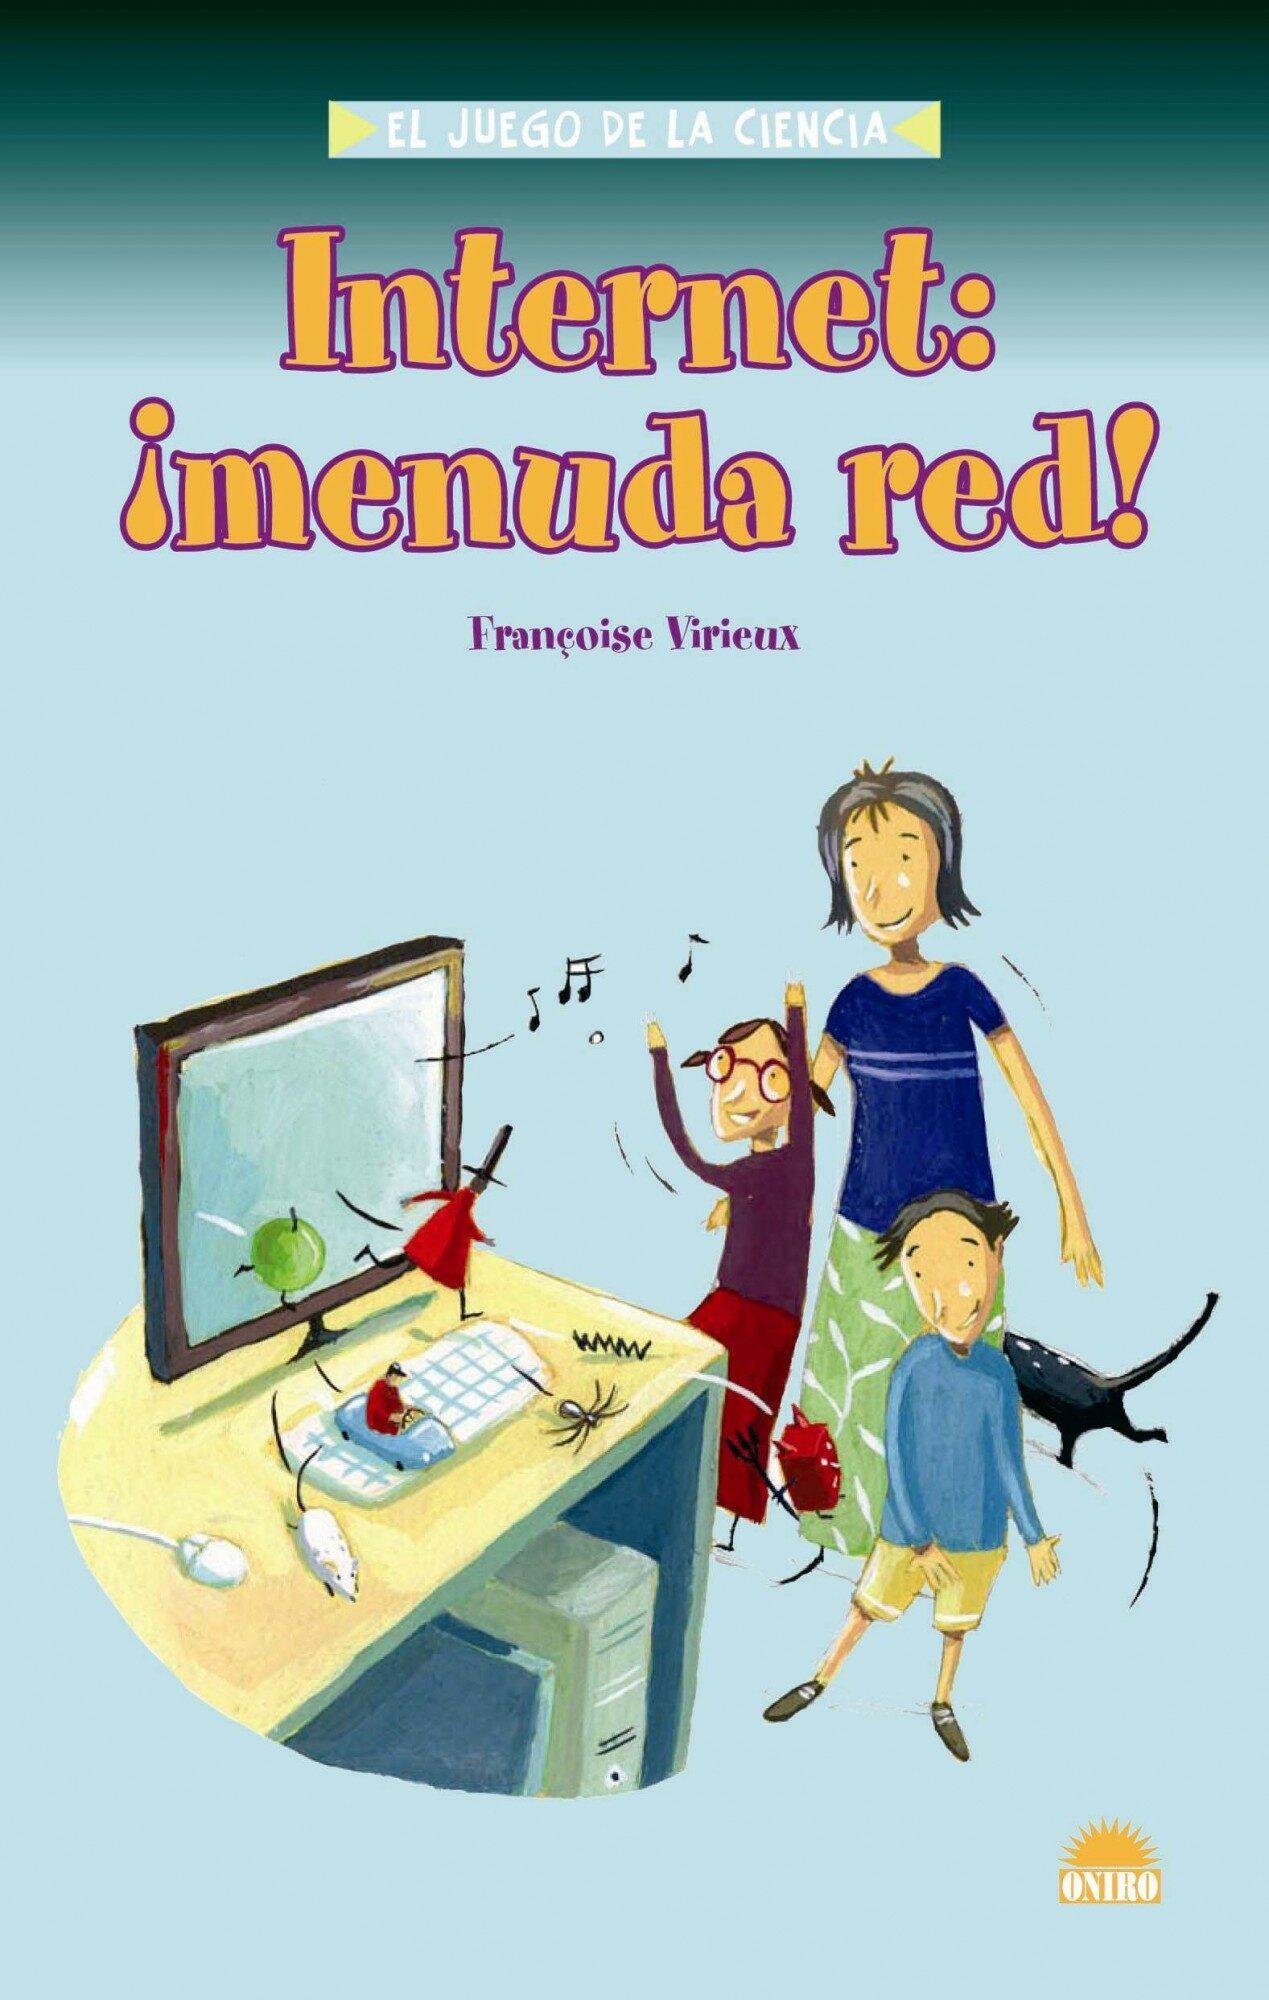 Internet: ¡menuda Red! por Françoise Virieux Gratis